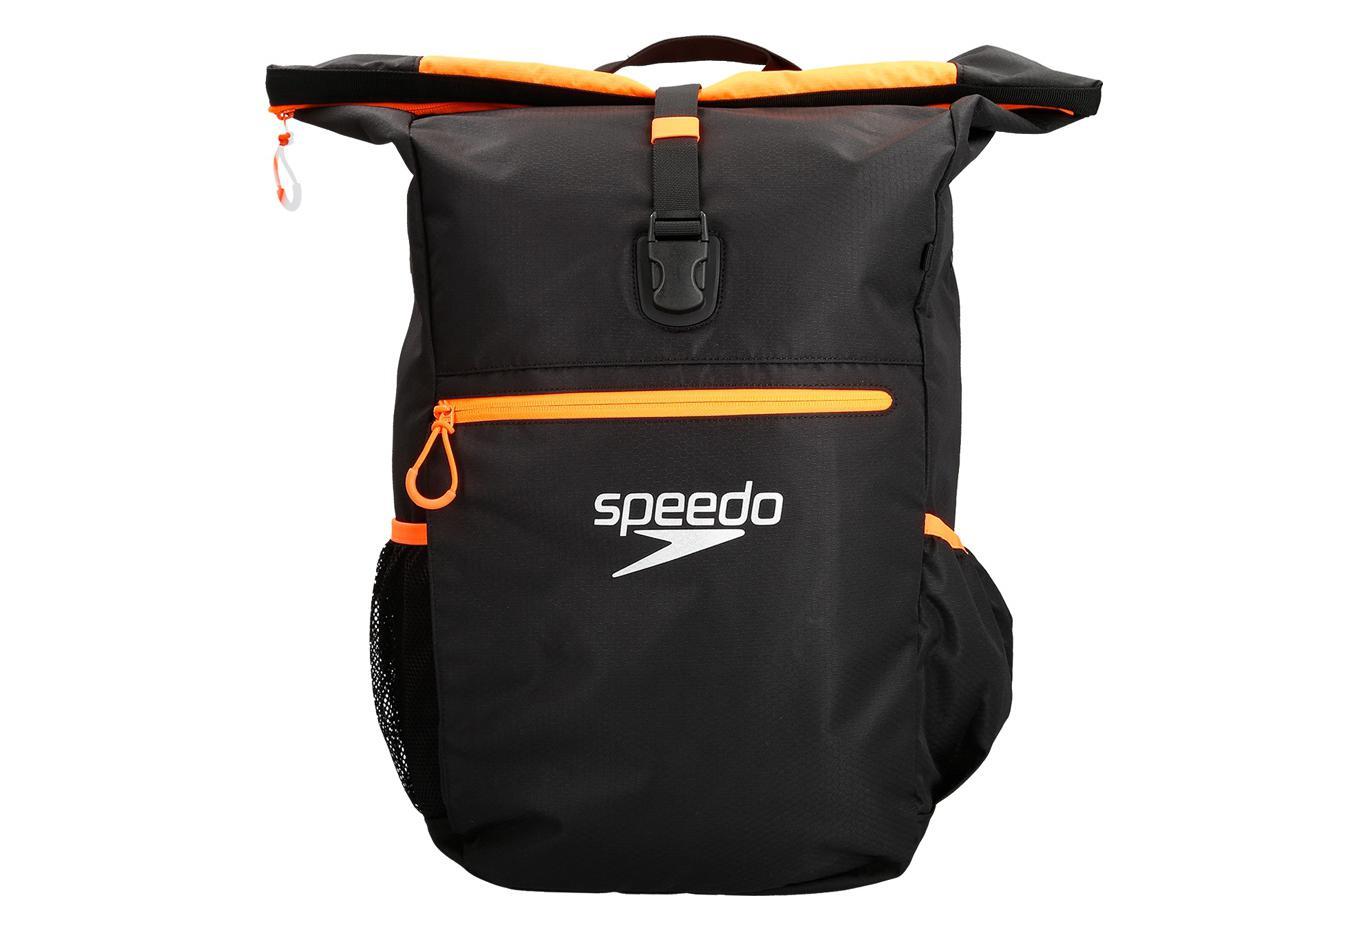 Speedo Team Rucksack III Black Orange